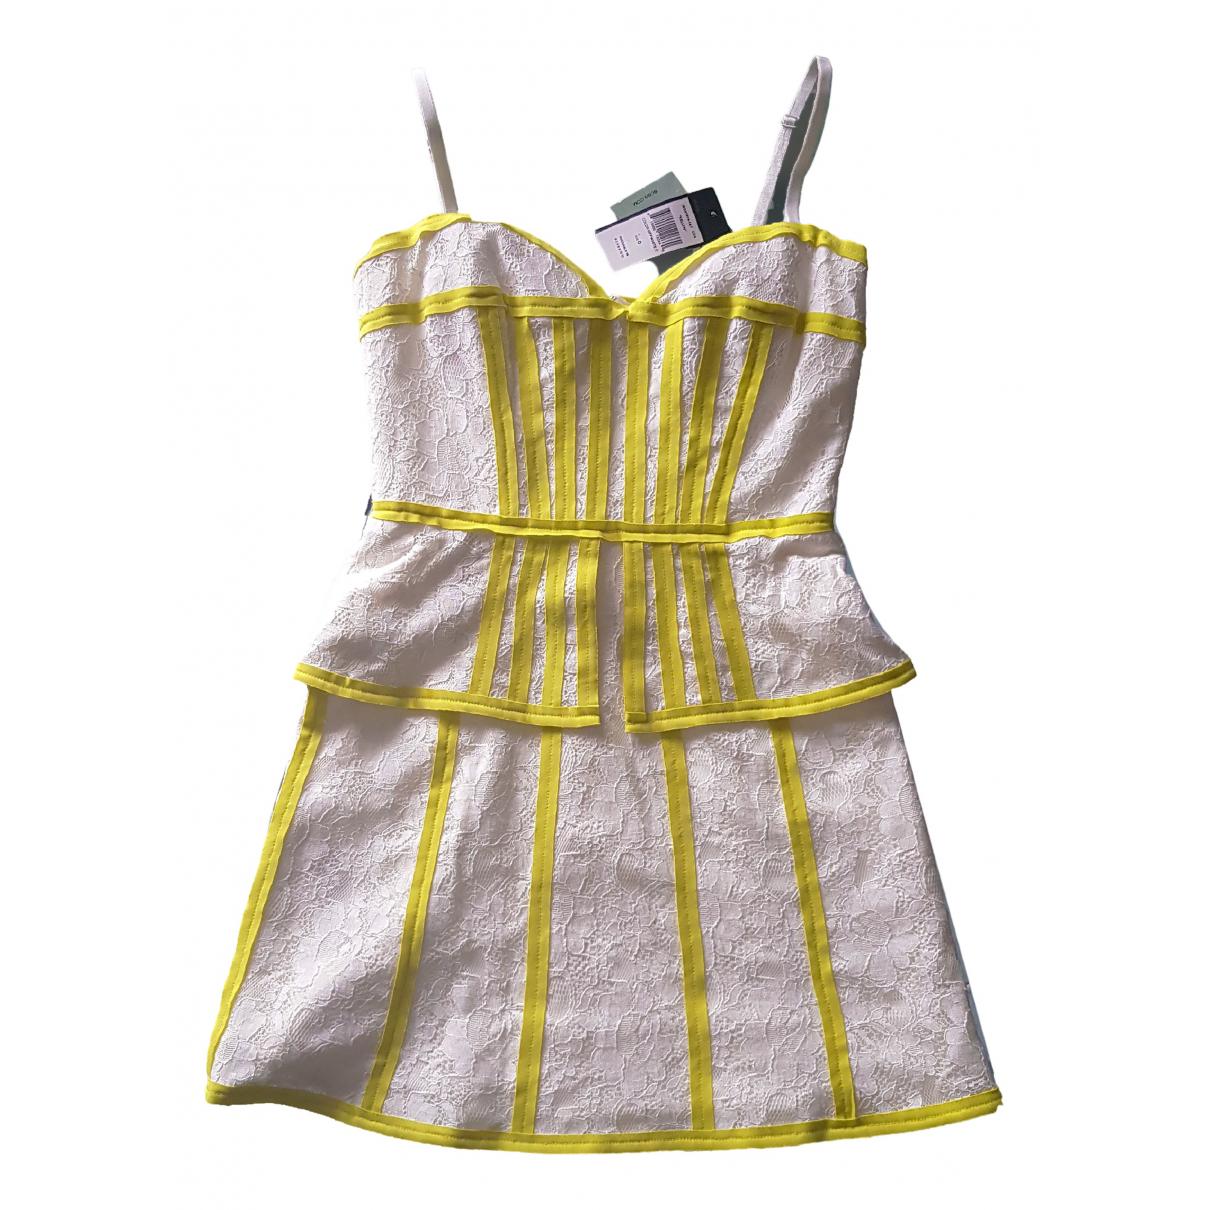 Bcbg Max Azria N White Lace dress for Women XS International